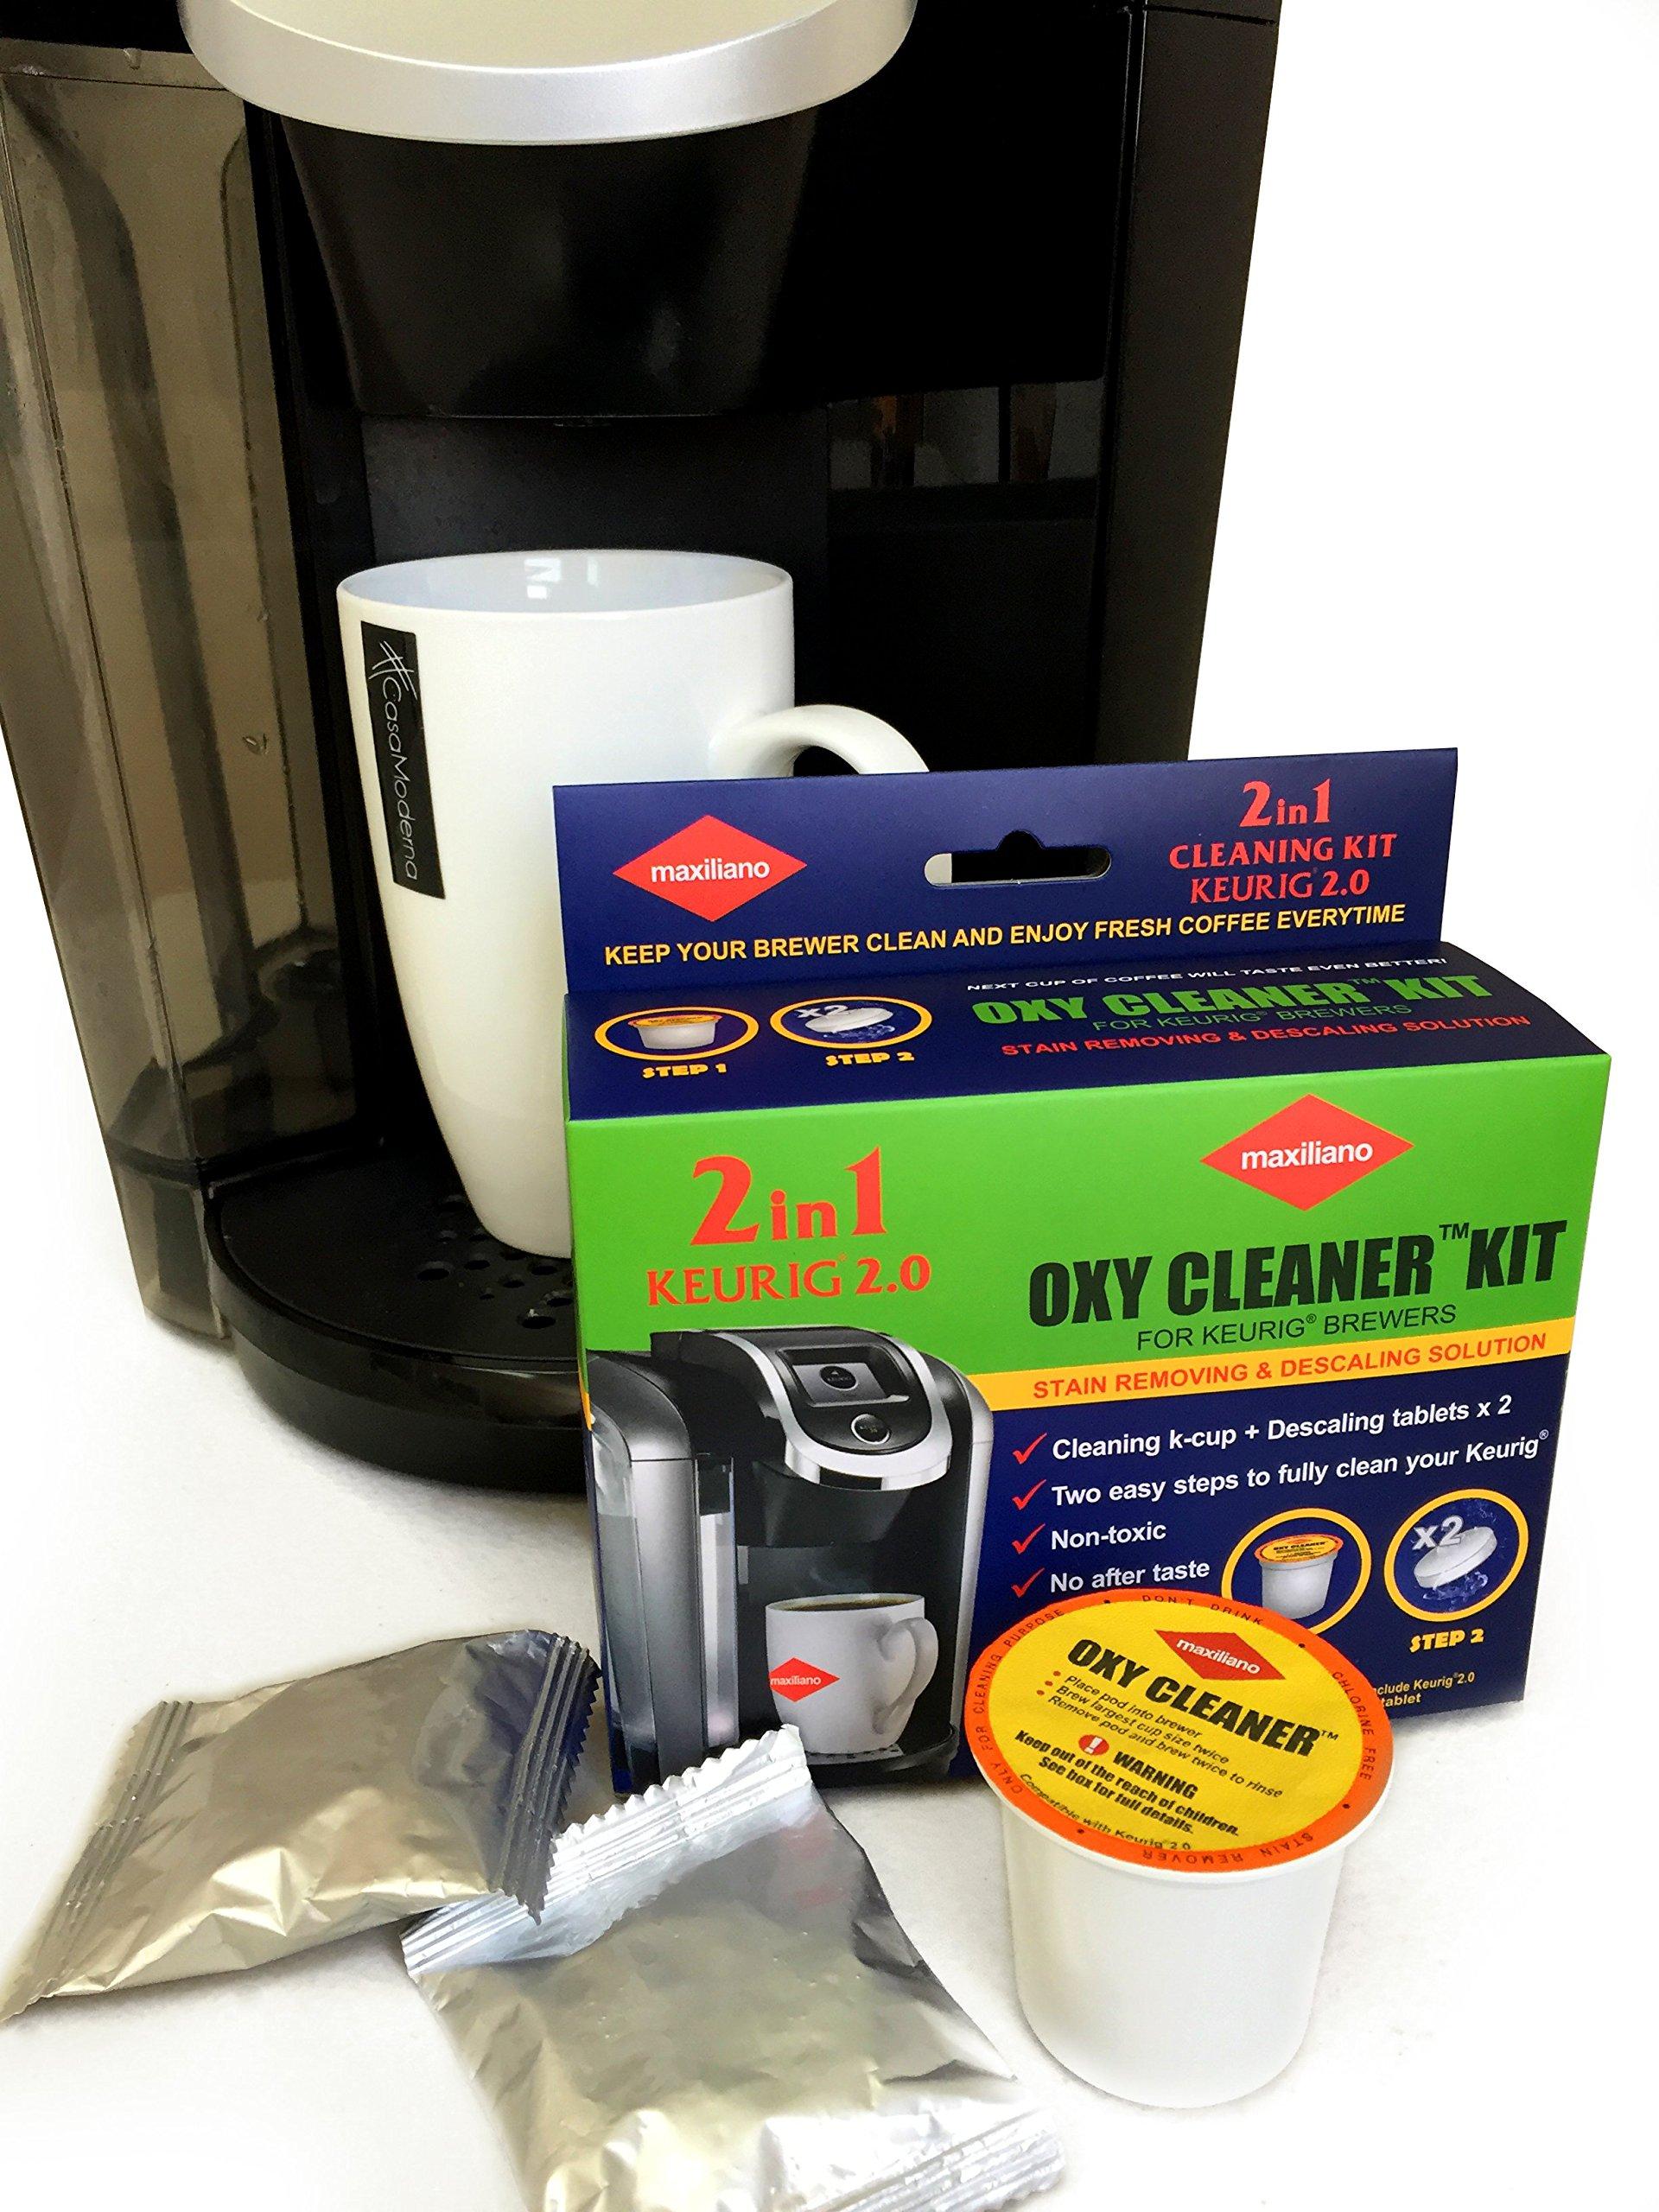 Galleon descaling kit descaler for keurig 2 0 for all k cup keurig brewers biodegradable for Kitchen set toys r us philippines